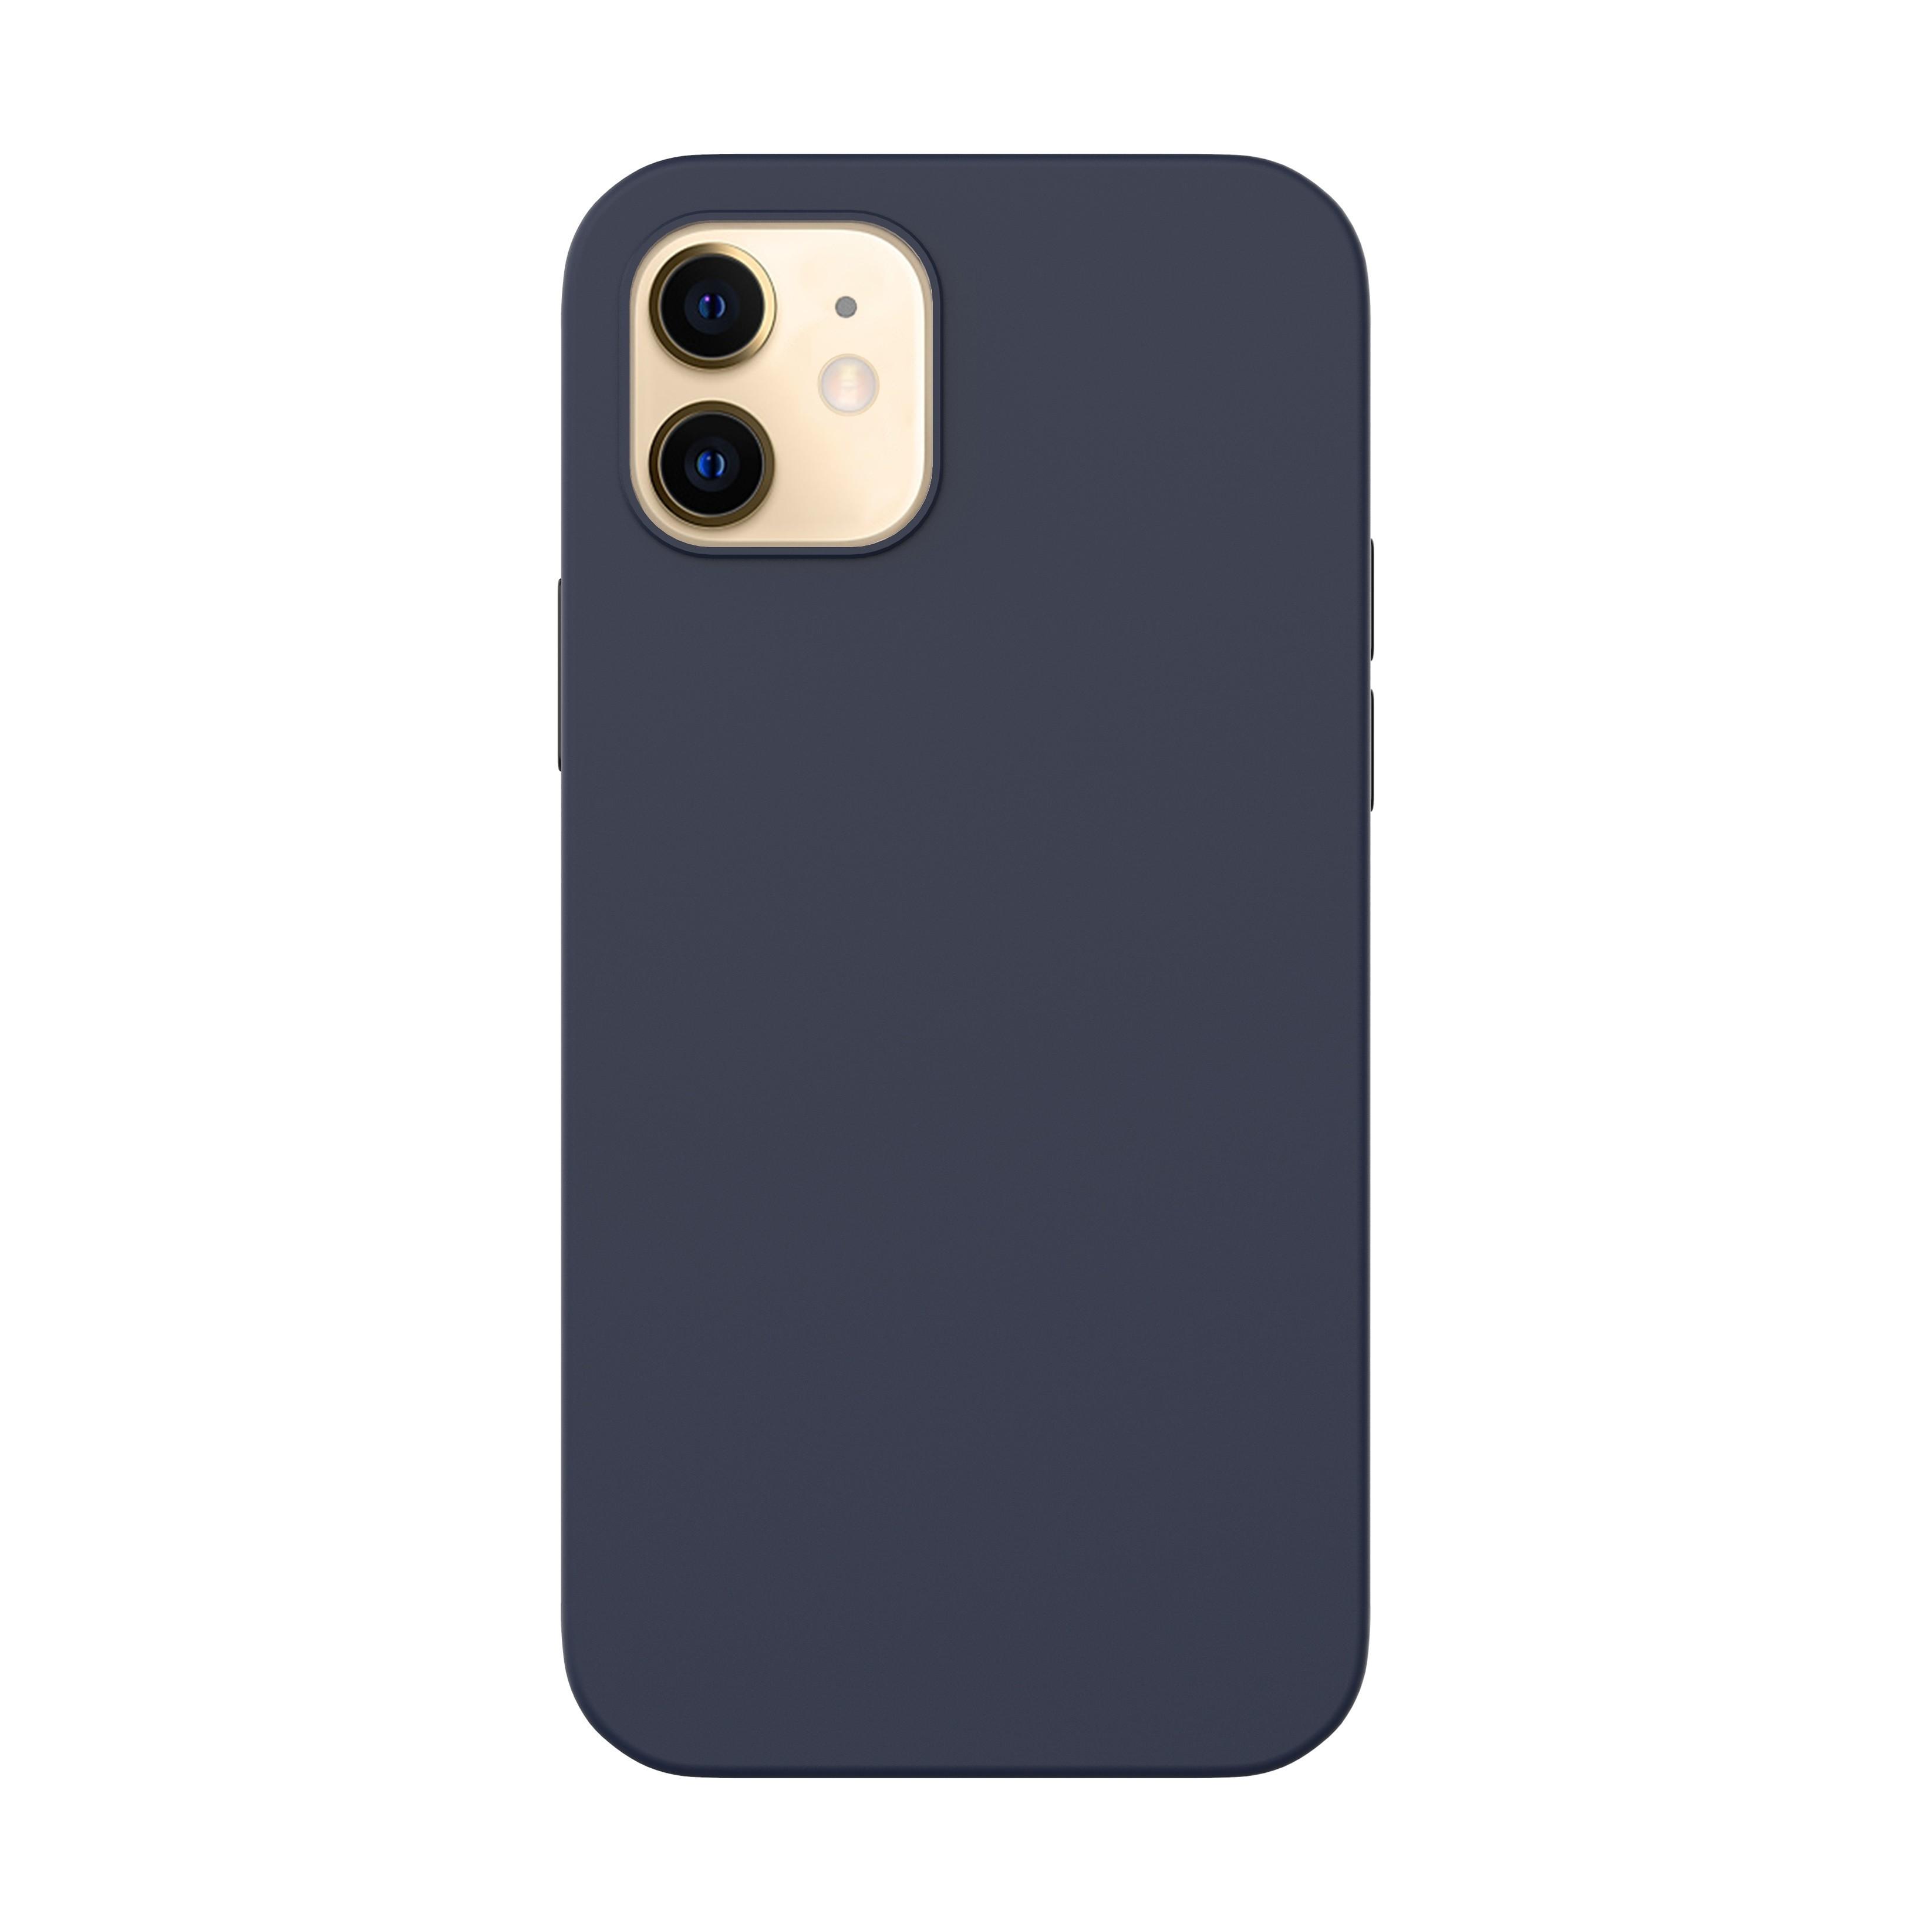 Capac protectie spate cellara din silicon colectia slim pentru iphone 12 mini - albastru